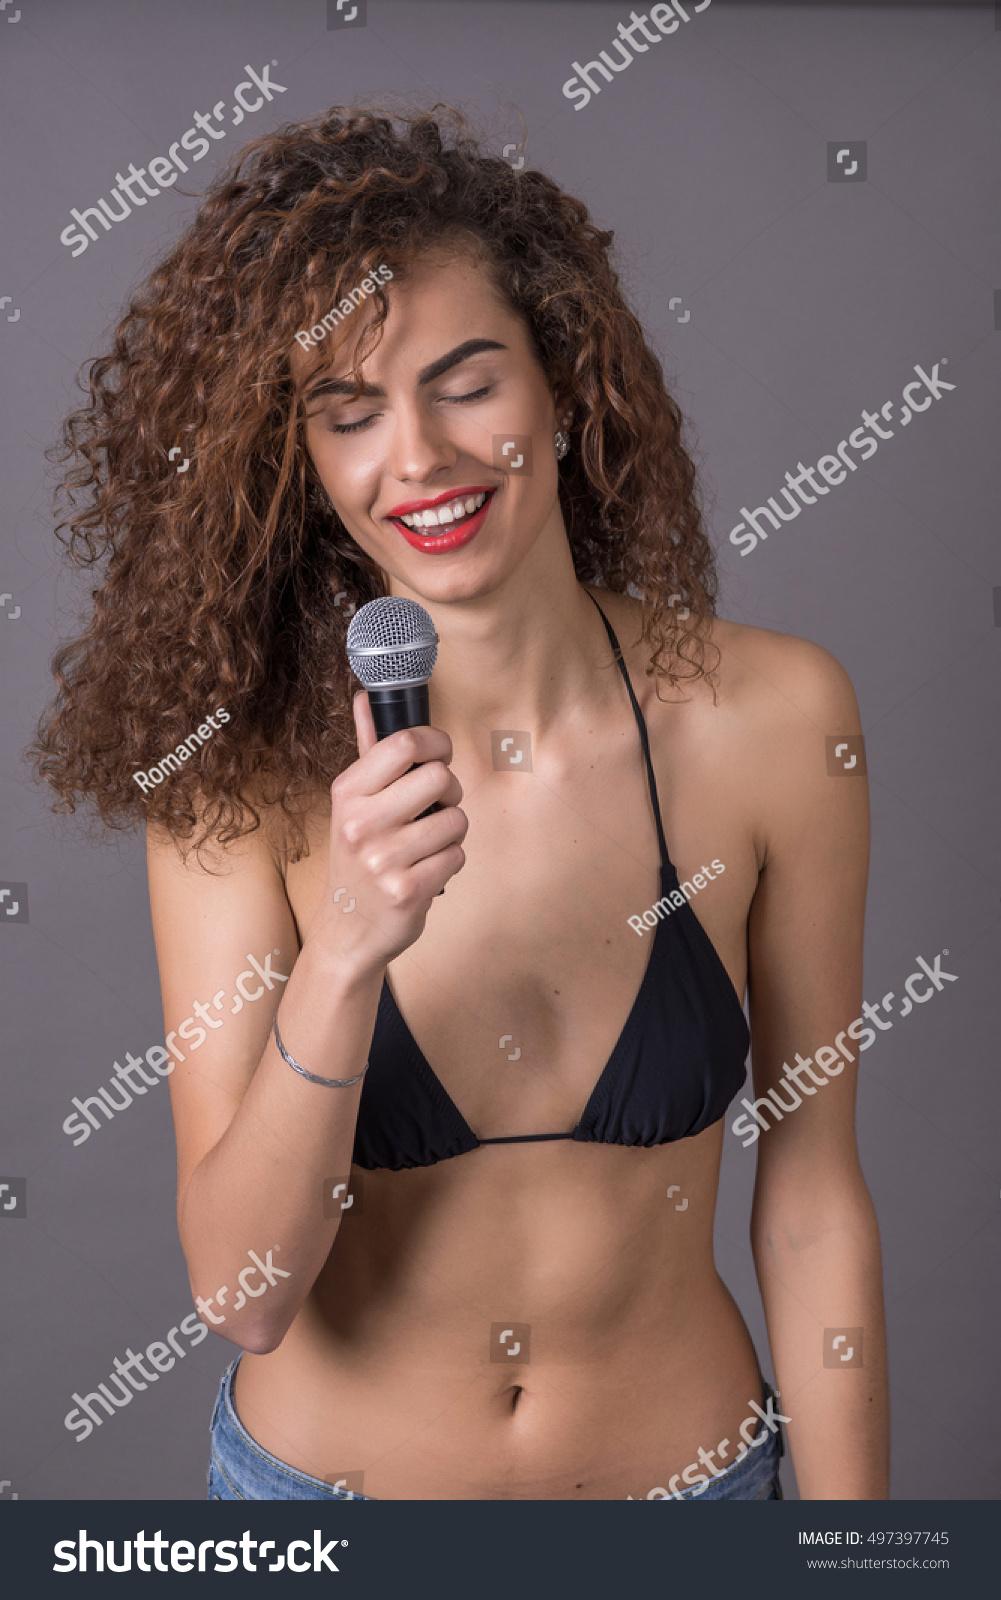 Bikini girl singing